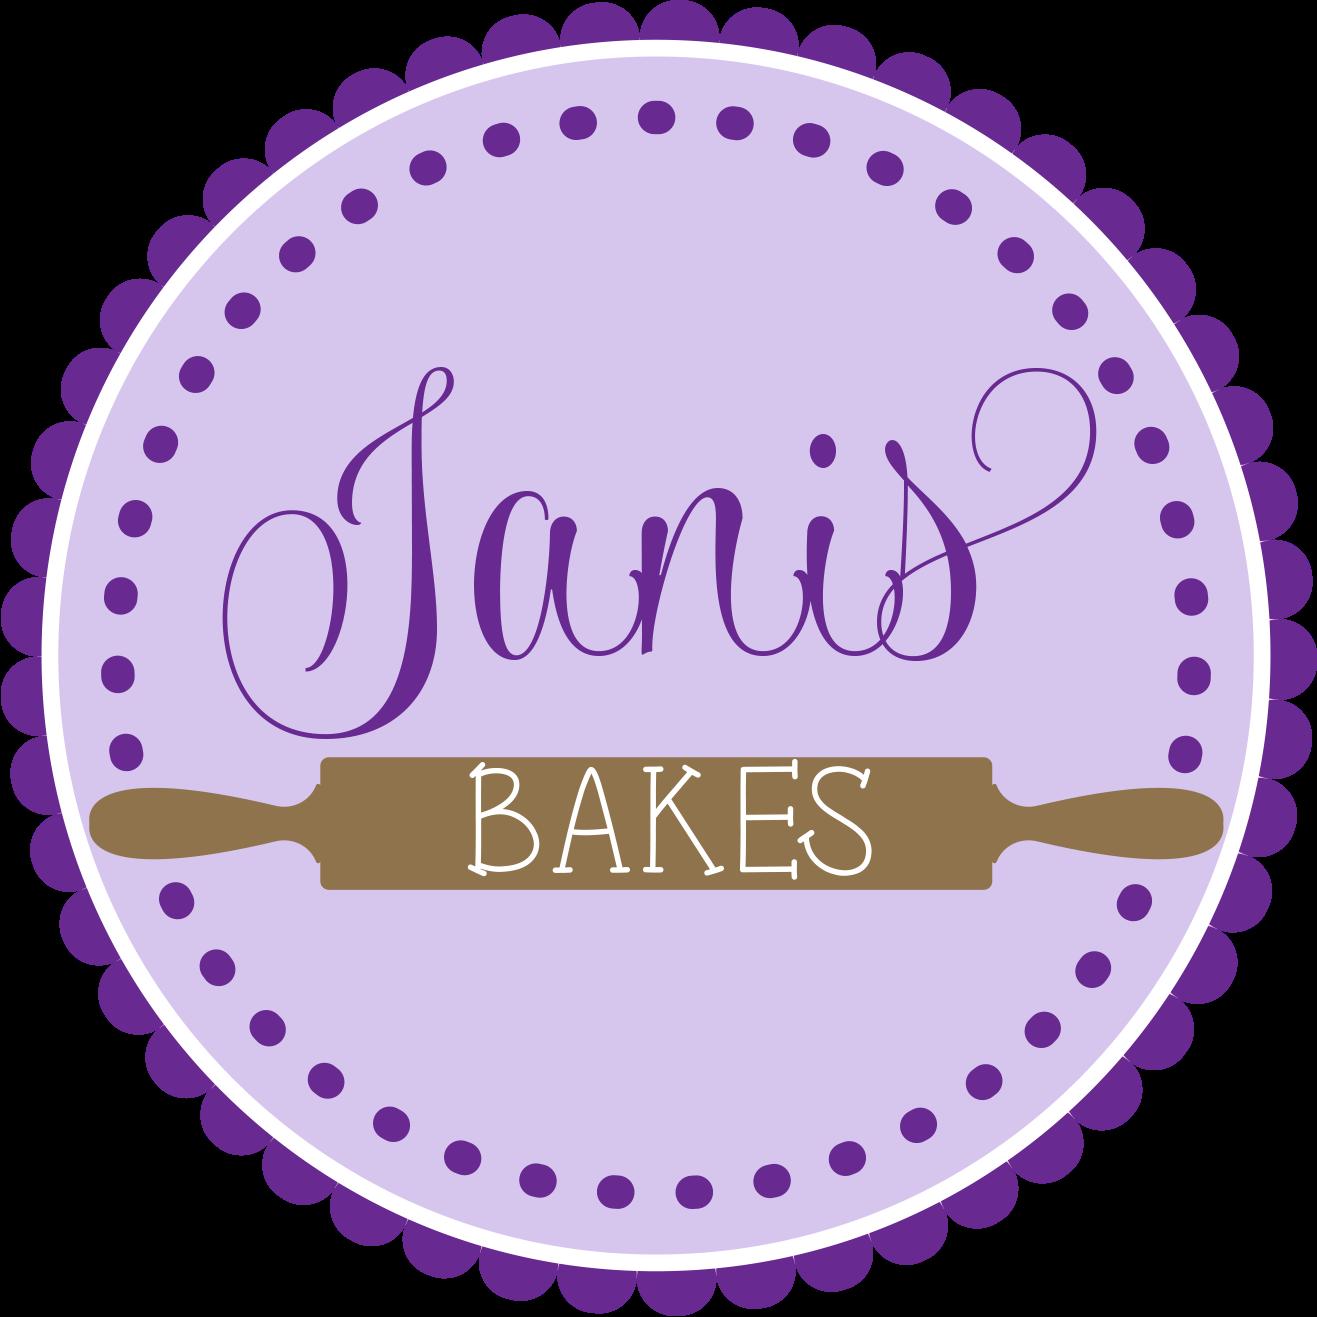 Janis Bakes Blog